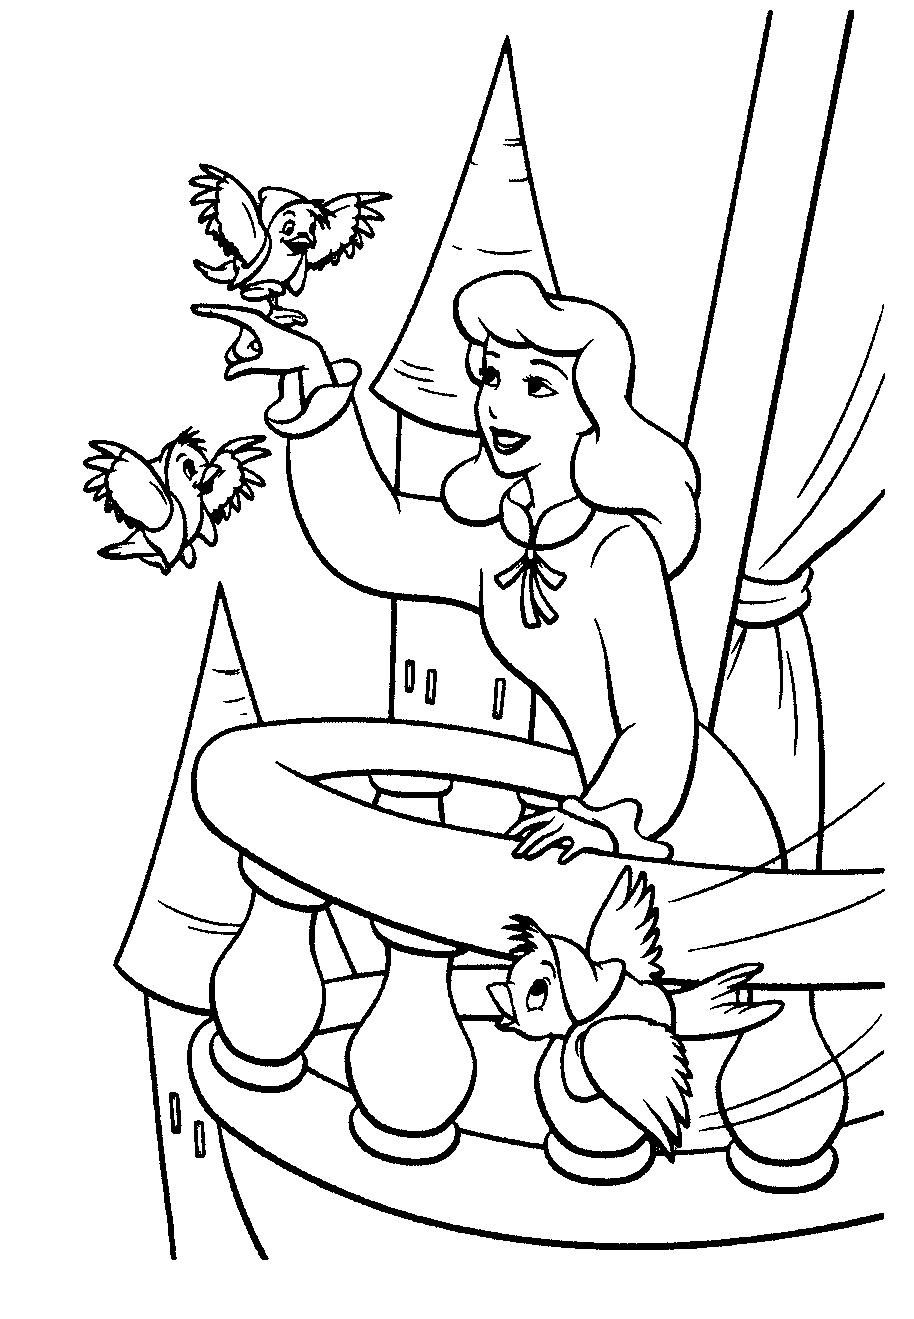 Золушка играет с птичками - раскраска №1017 | Printonic.ru